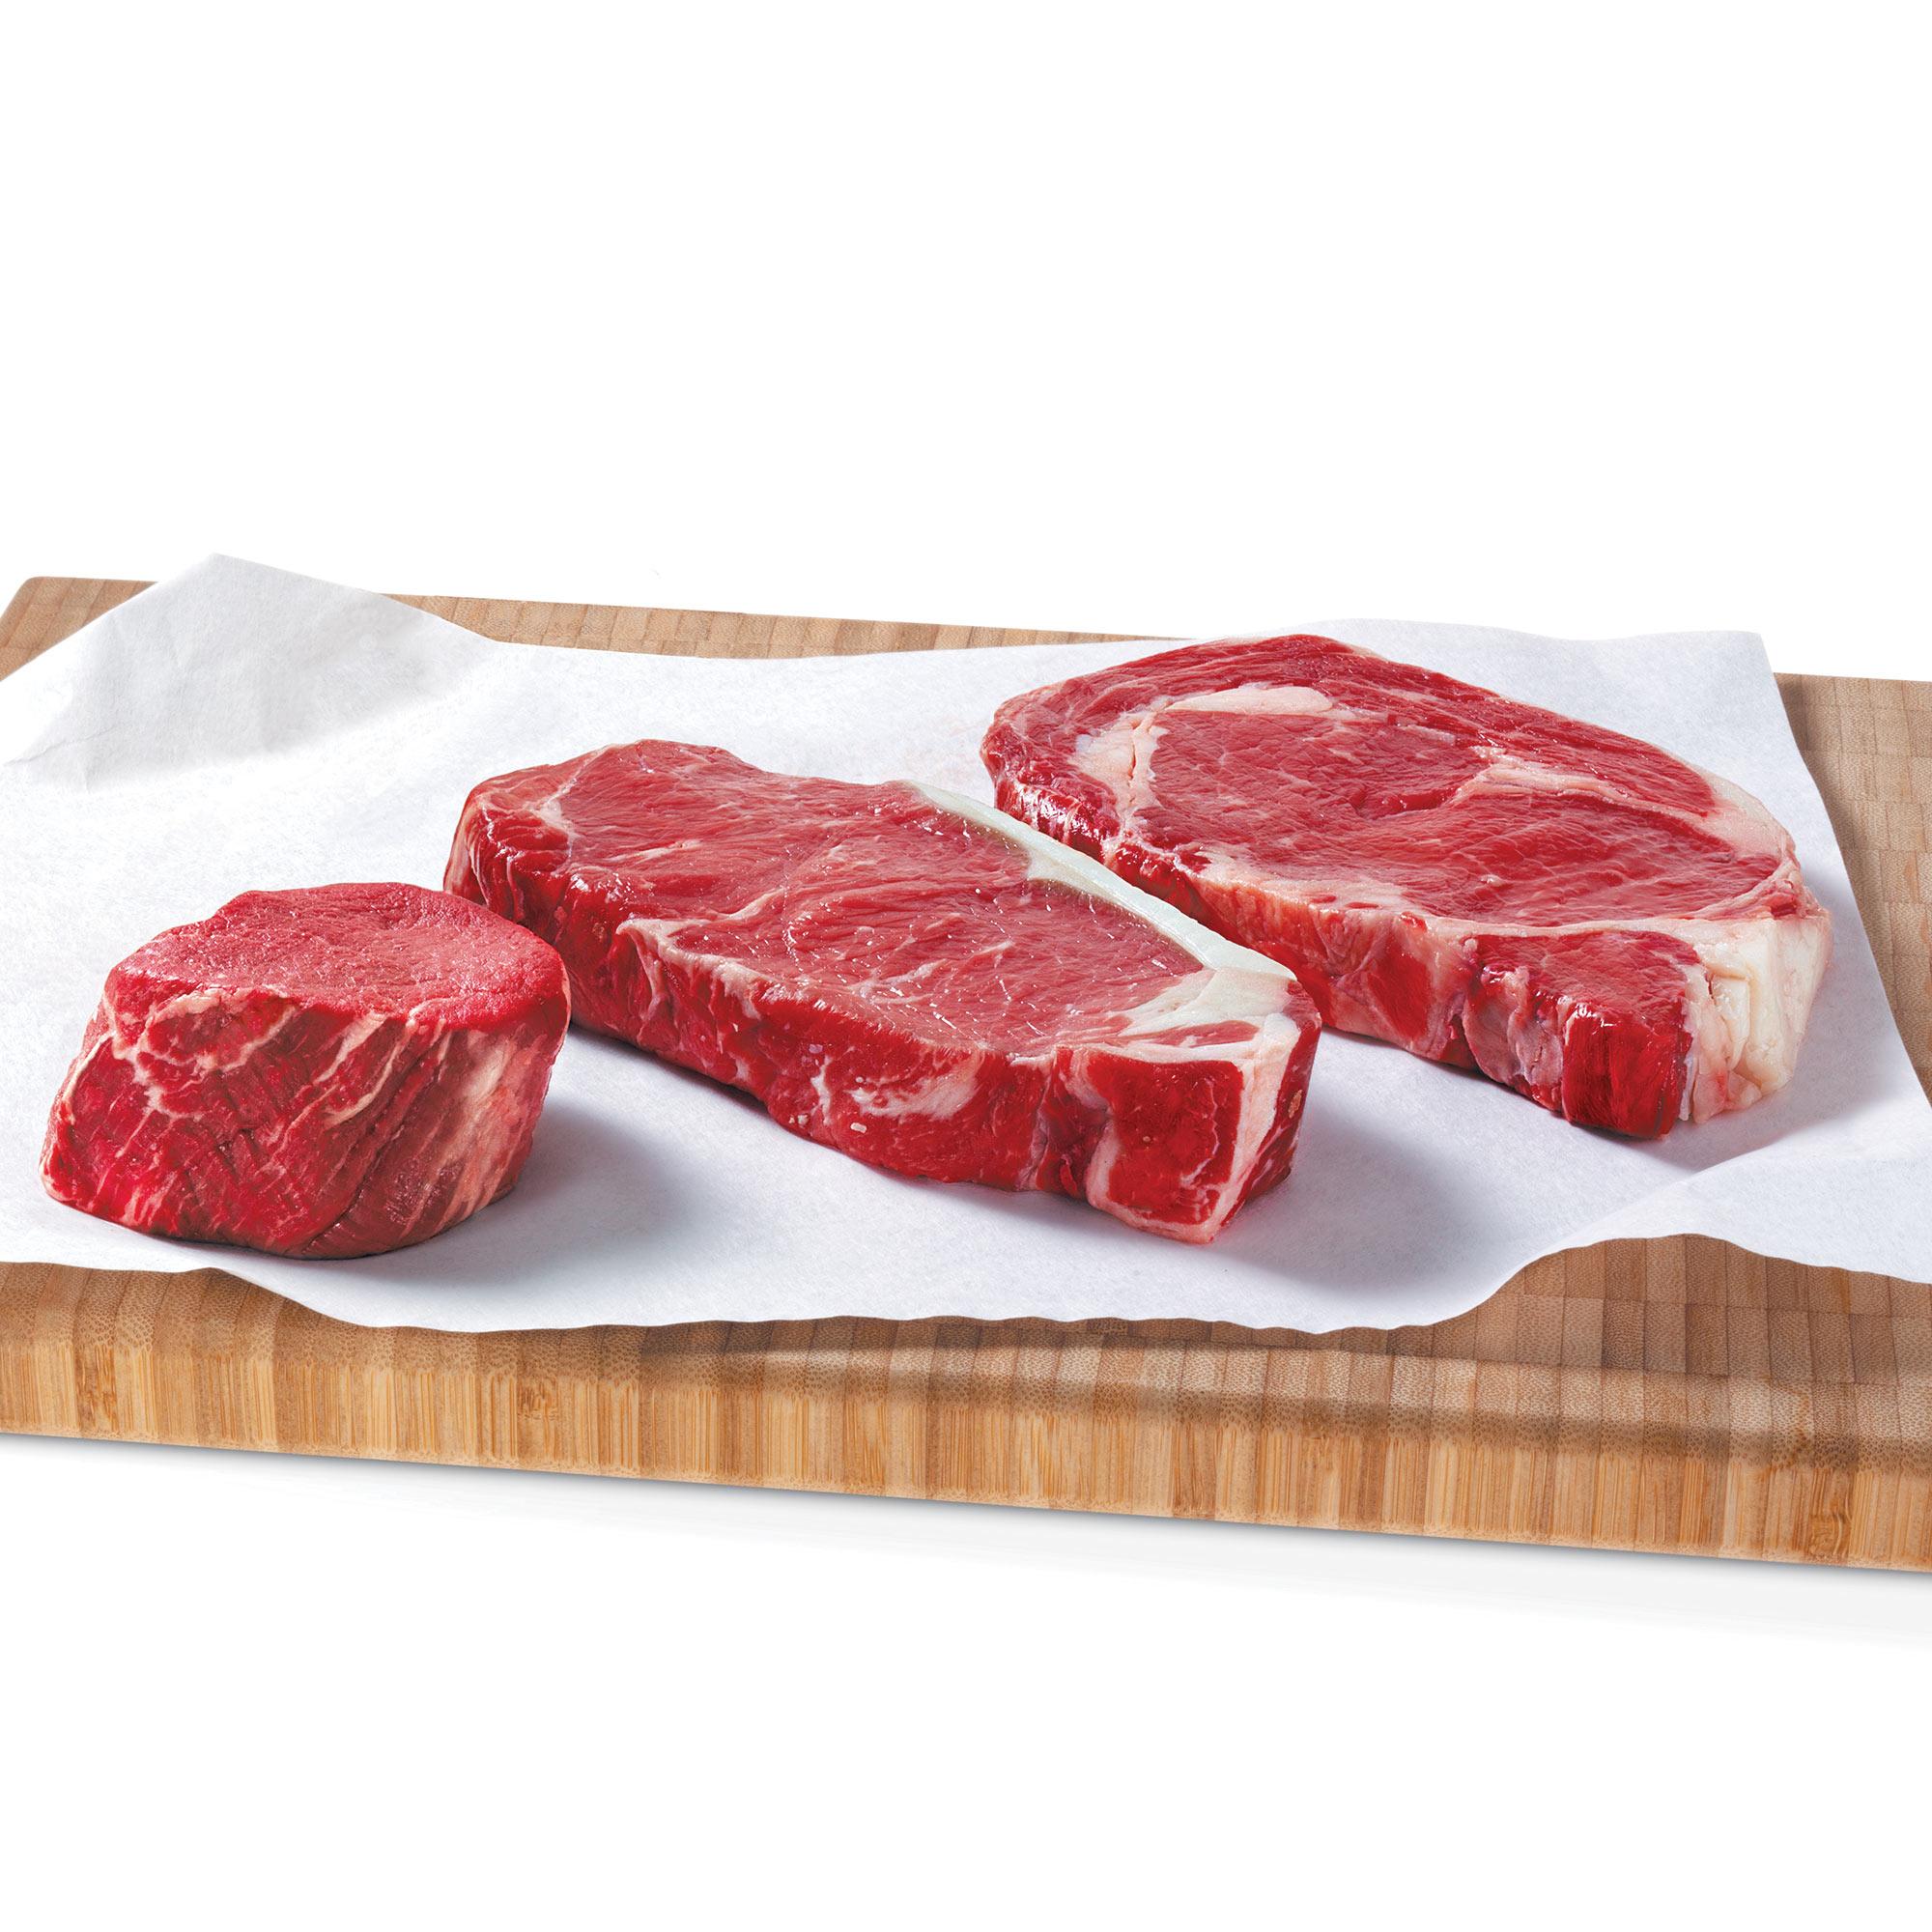 Pfaelzer's Quartet Assortment includes filets, New York strip steaks, and boneless ribeye steaks